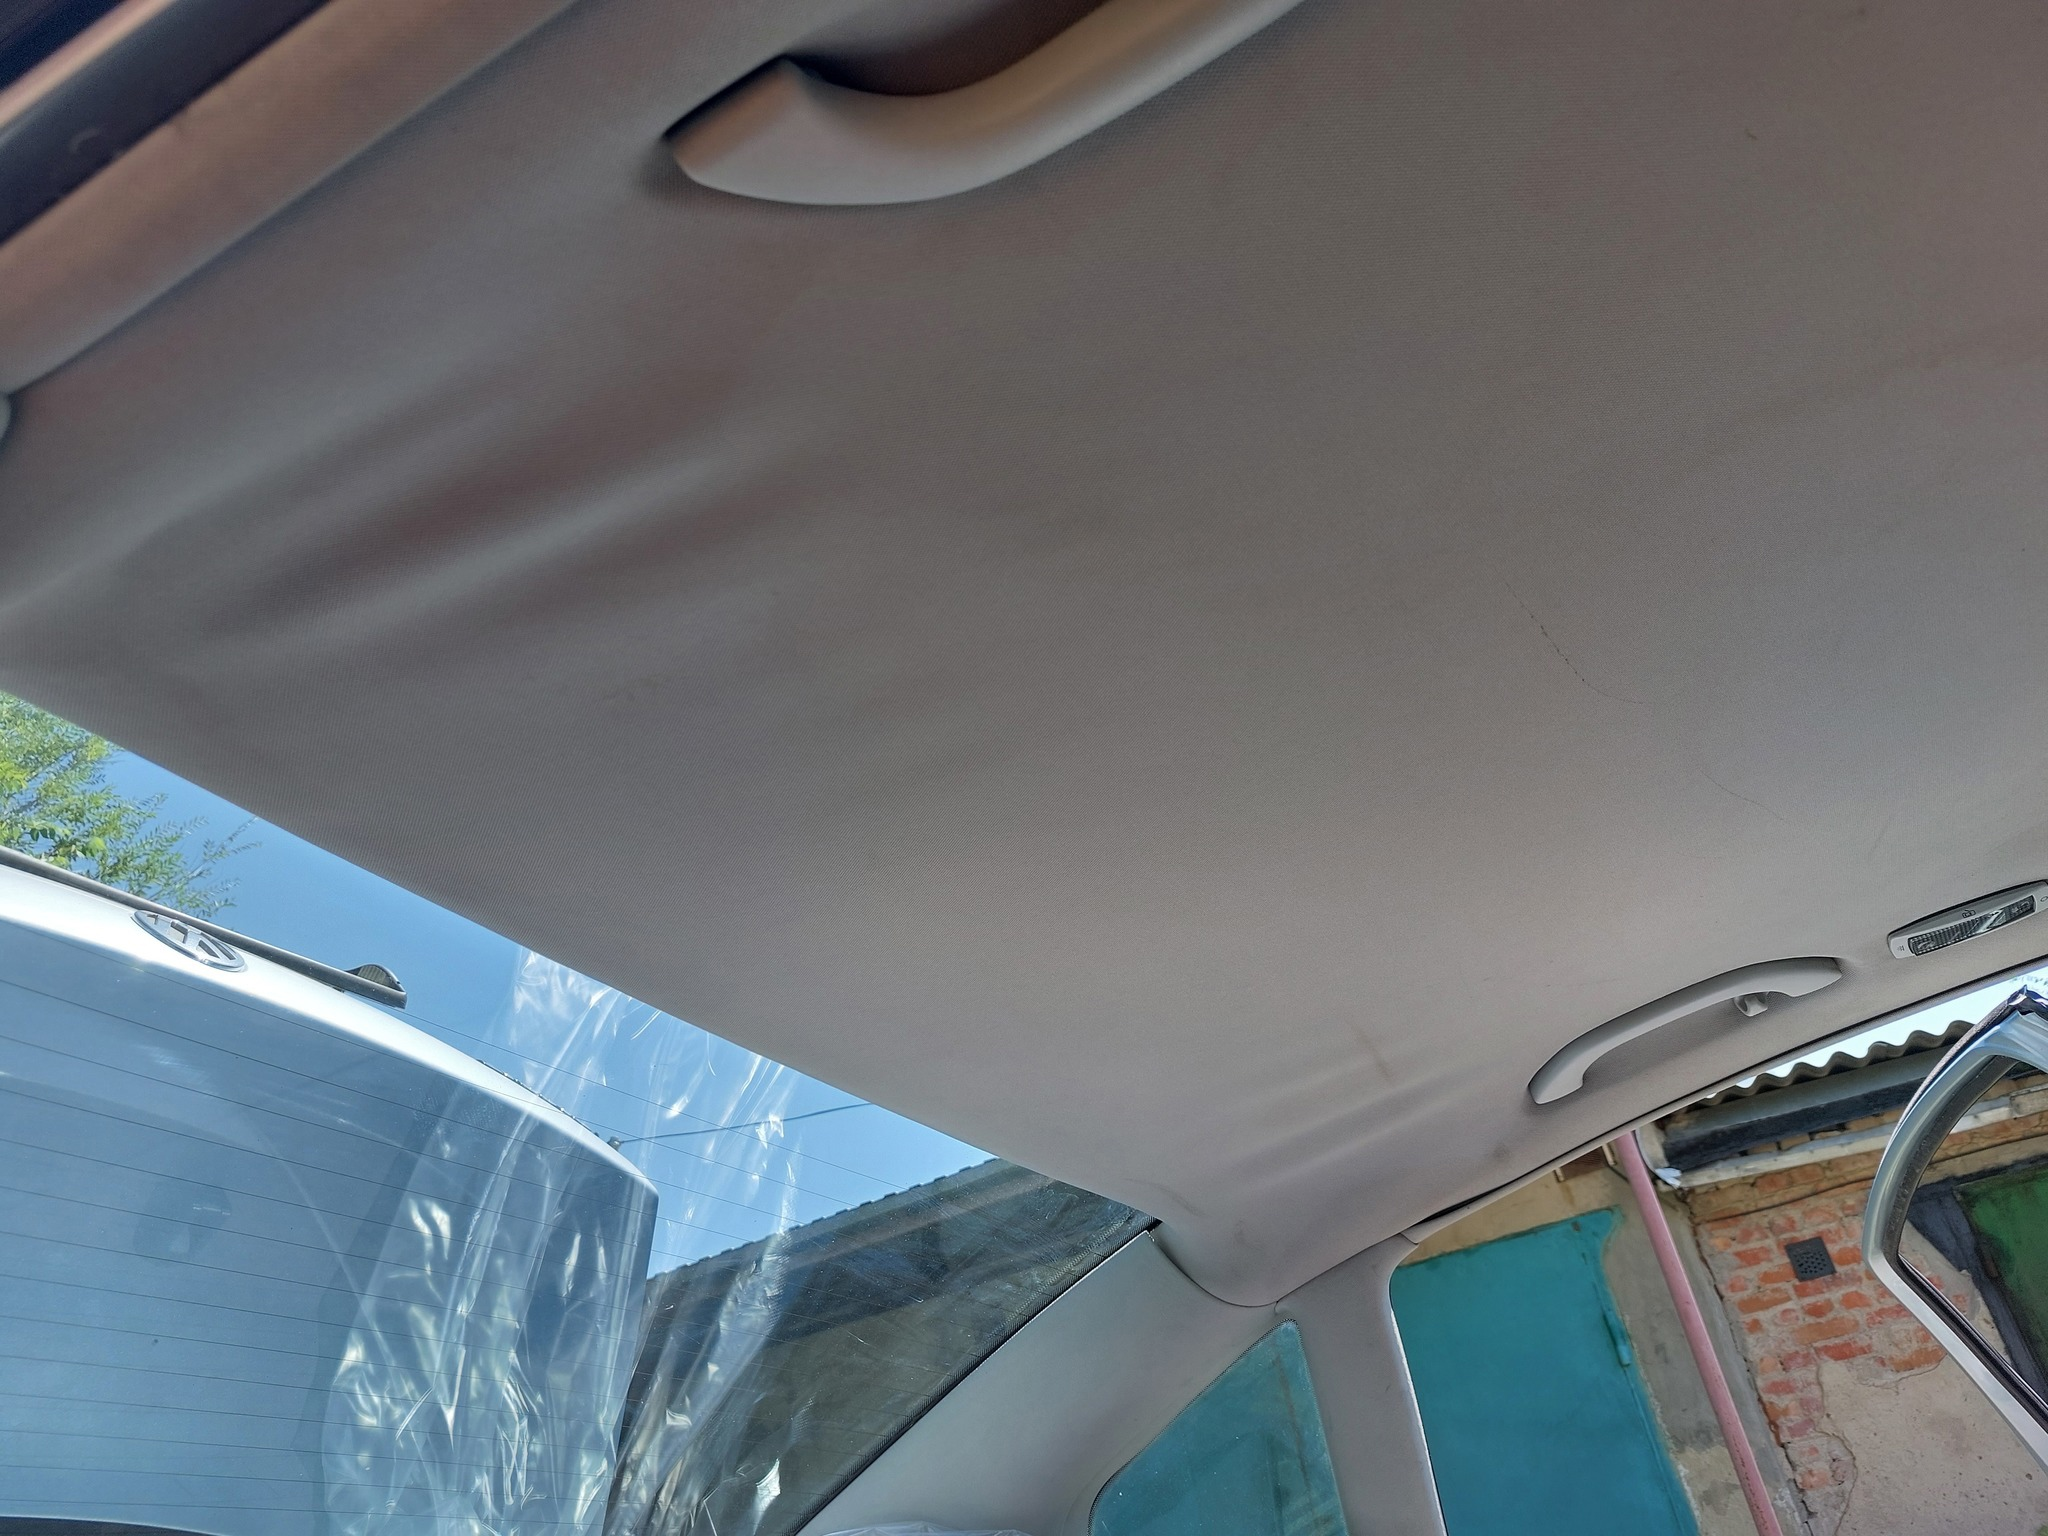 Провис потолок в автомобиле